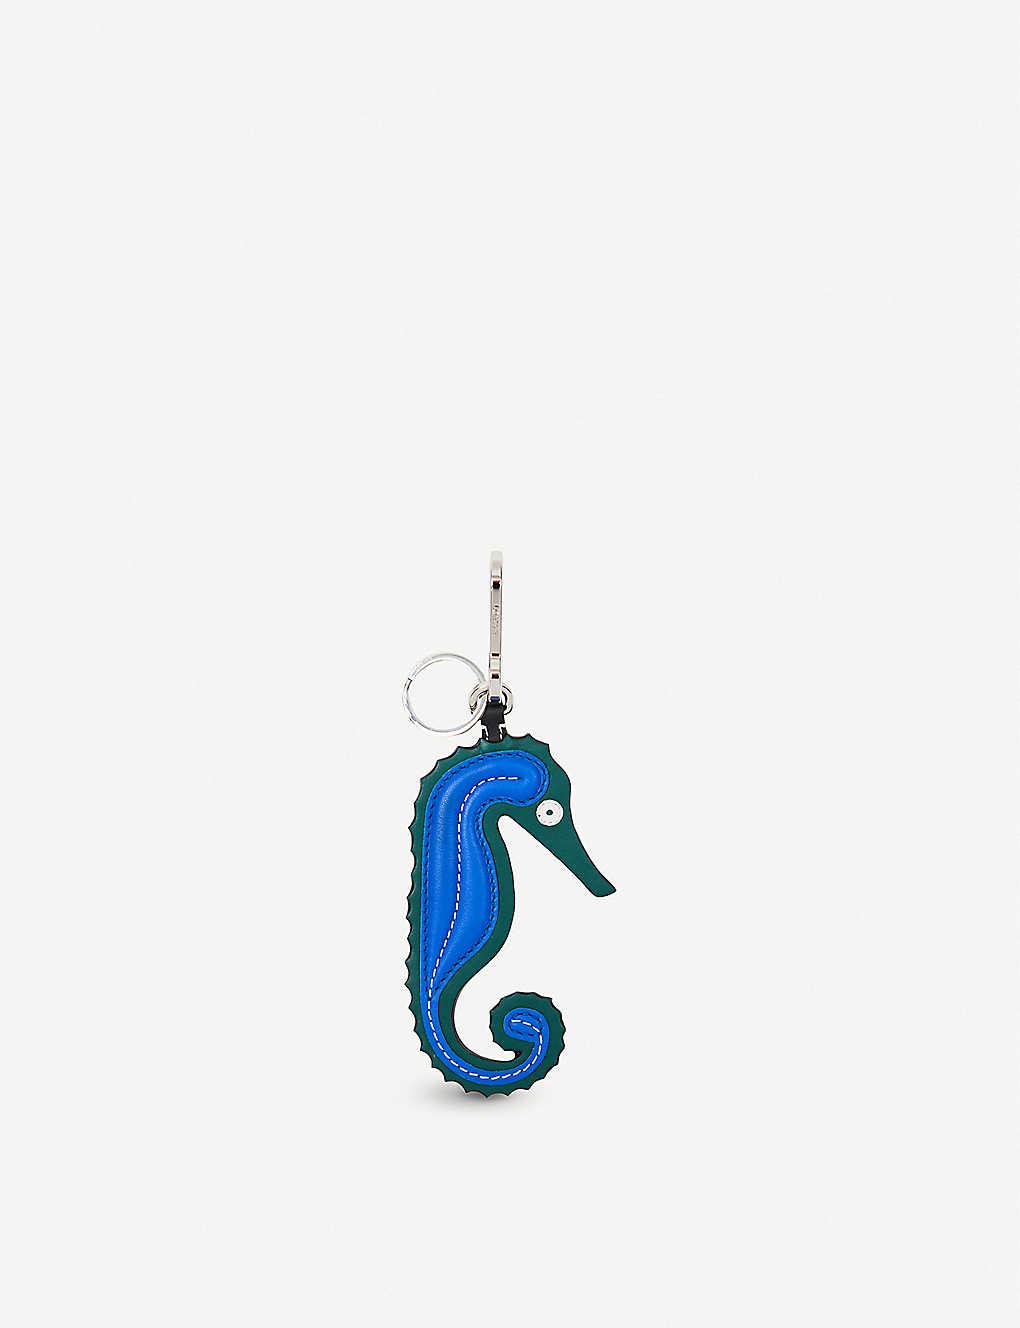 Sea Horse Charm Bag Accessory in Green and Blue Calf and Brass Loewe ne5EXMp5